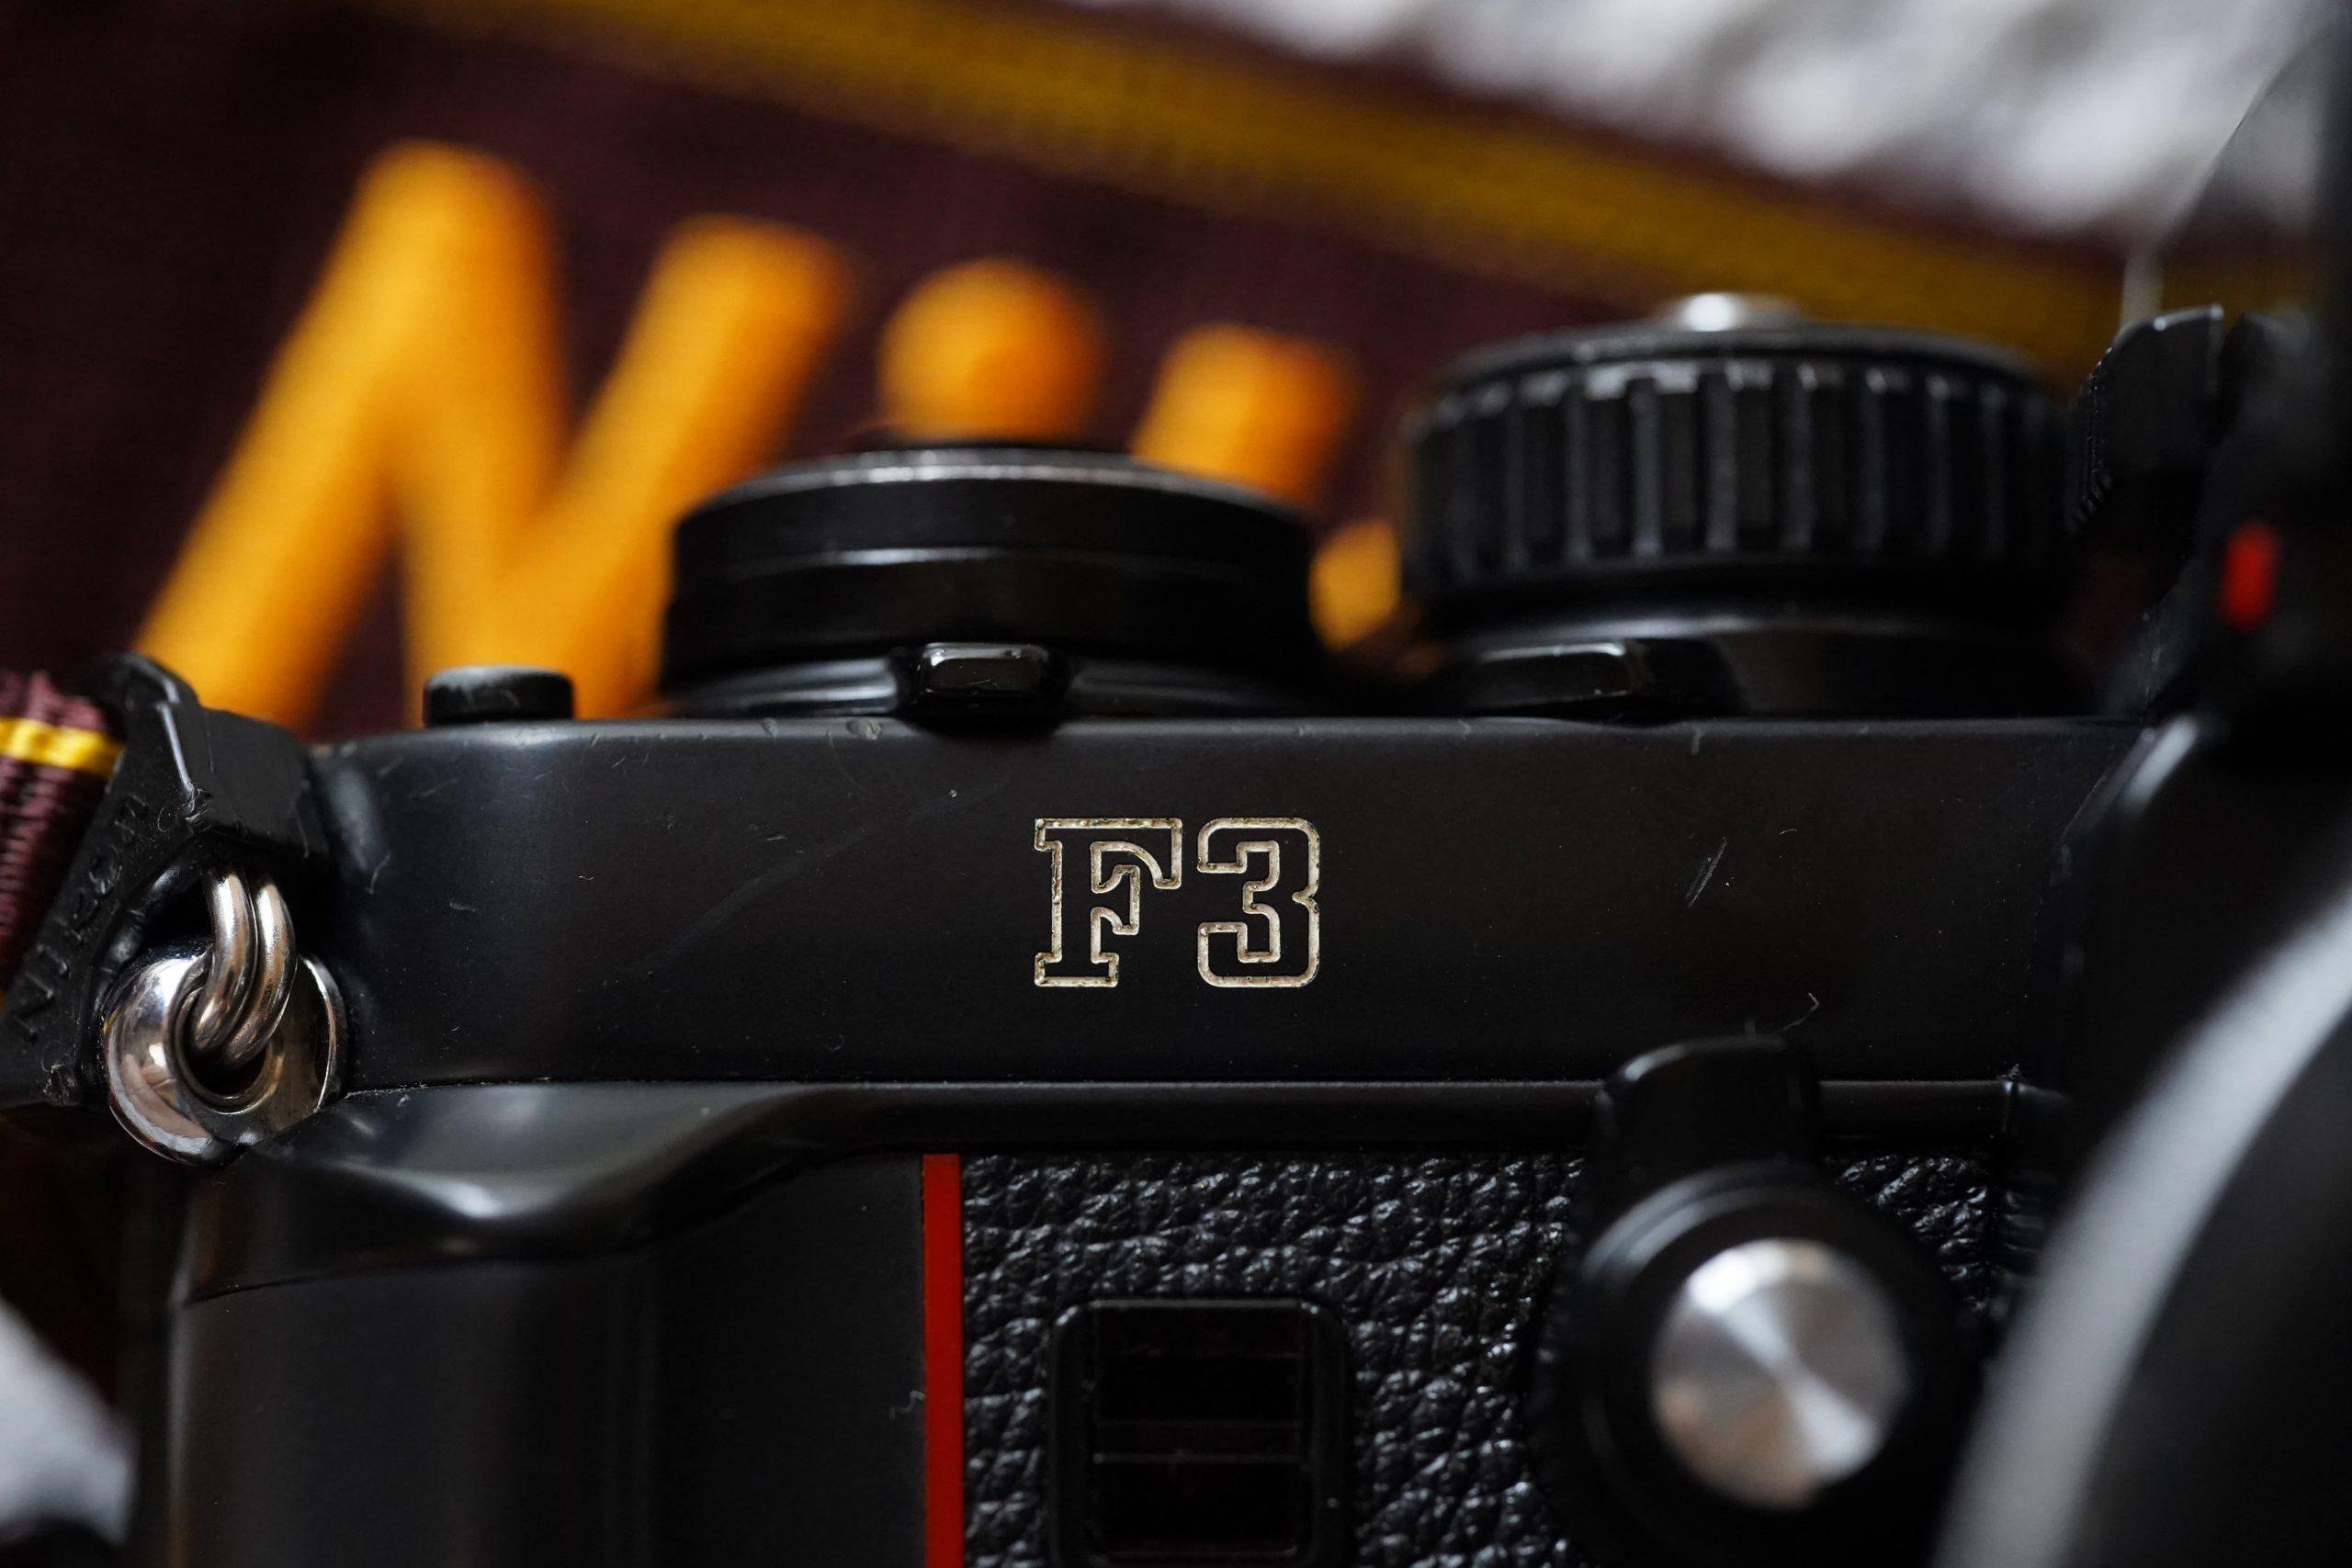 【Nikon】Nikon F3を撮る